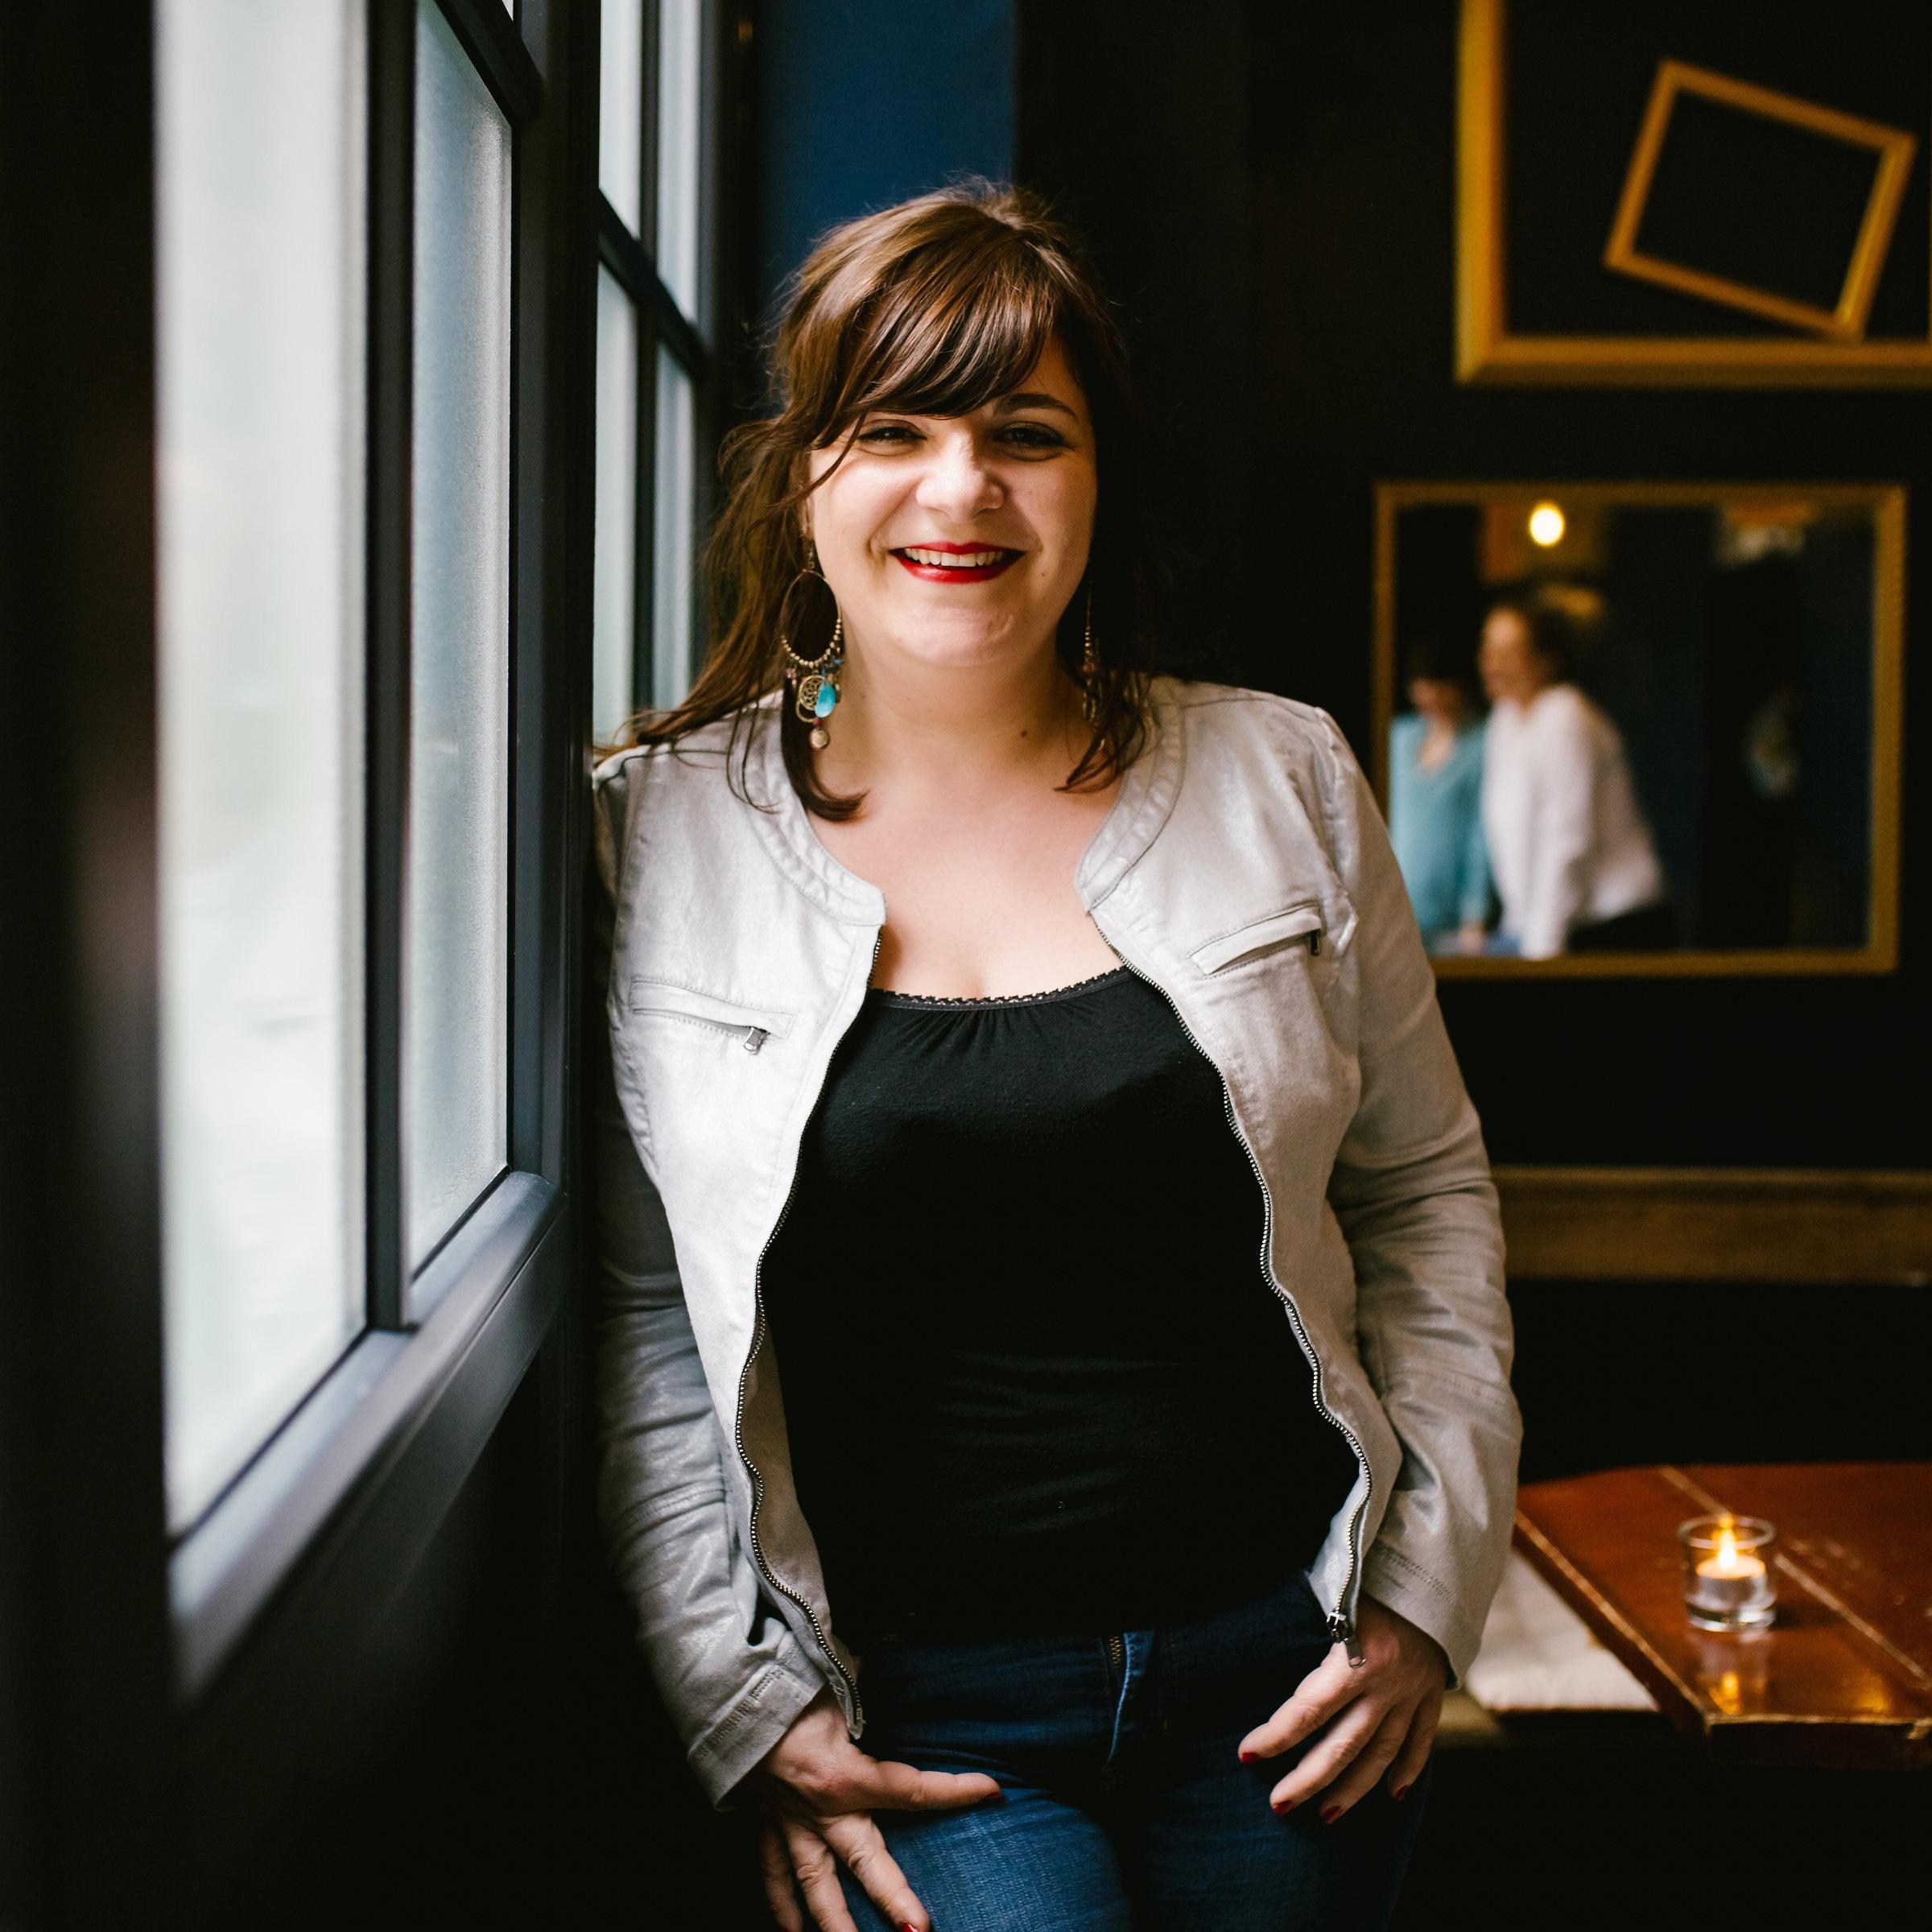 Marie Stoessel